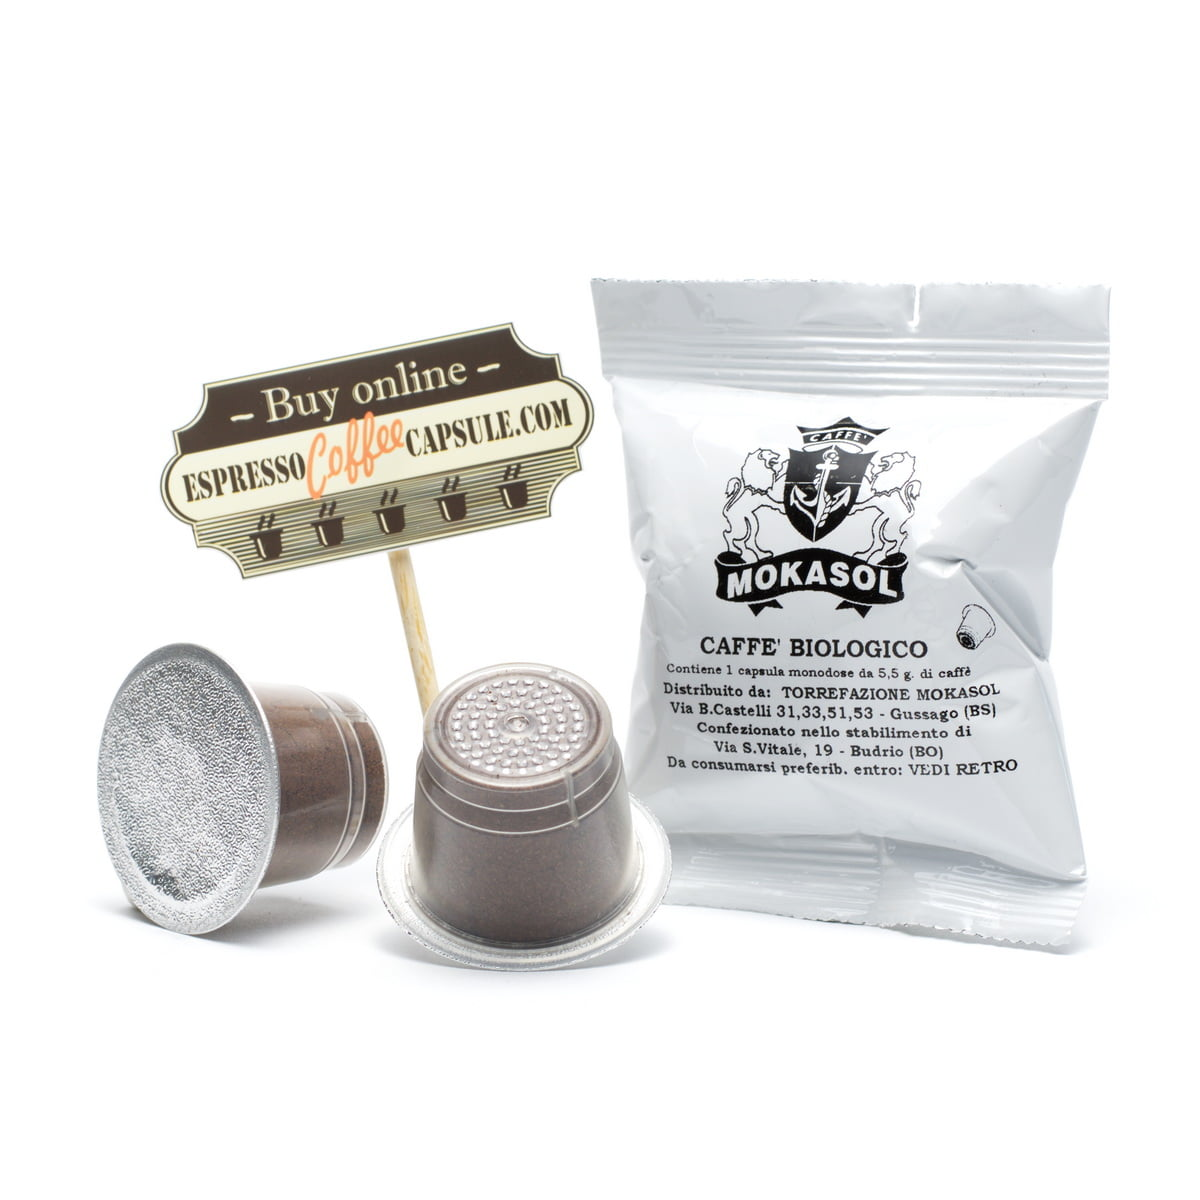 MOKASOL Biologico coffee capsules for nespresso